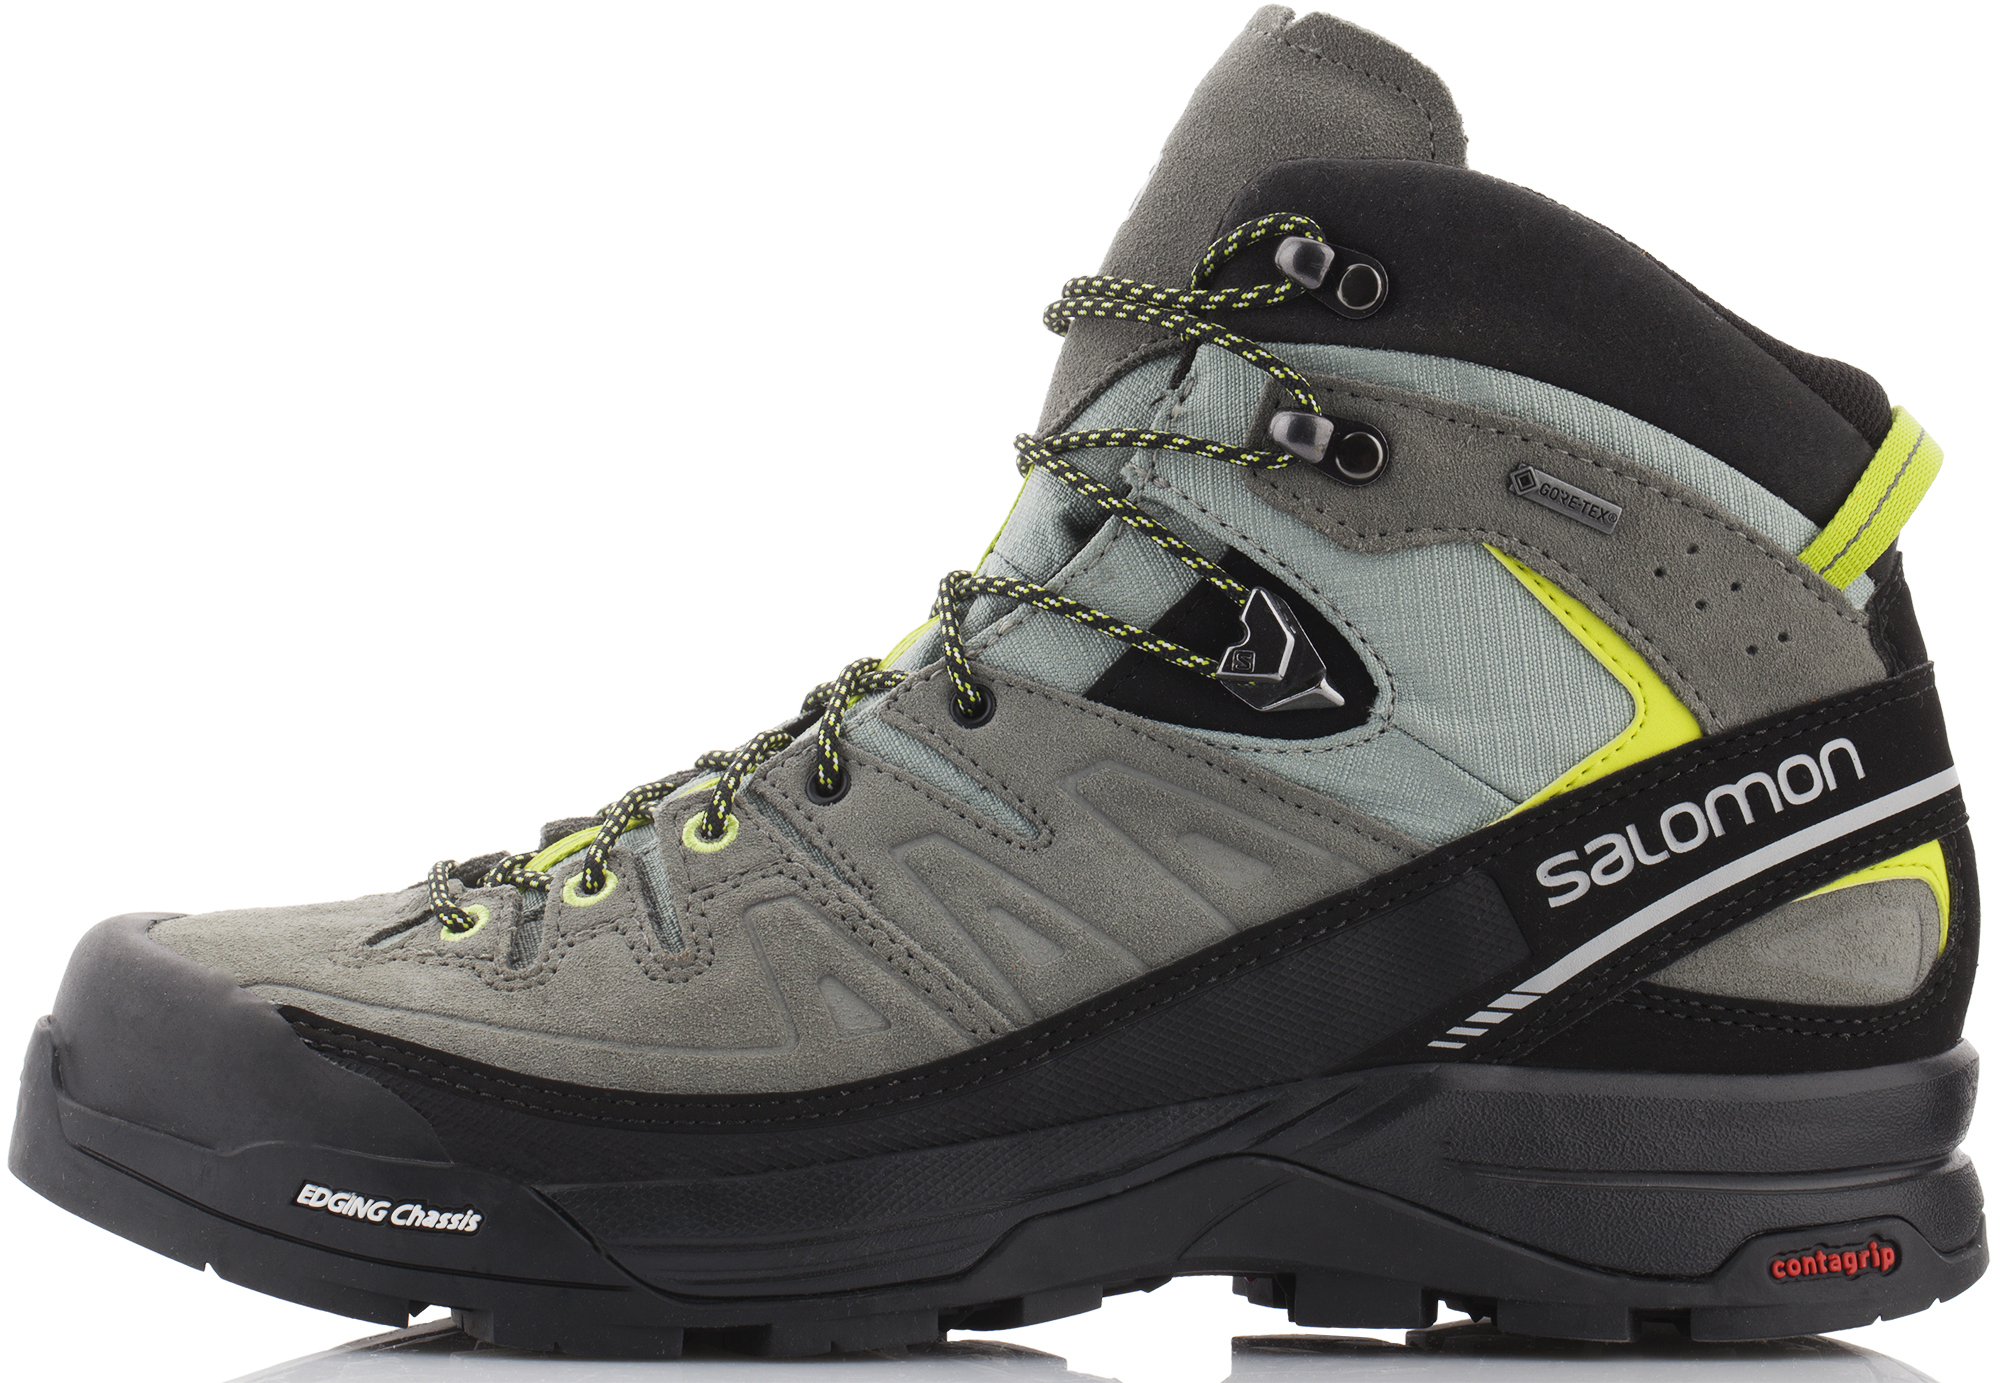 Salomon Ботинки мужские Salomon X Alp Mid salomon ботинки мужские salomon x alp mid